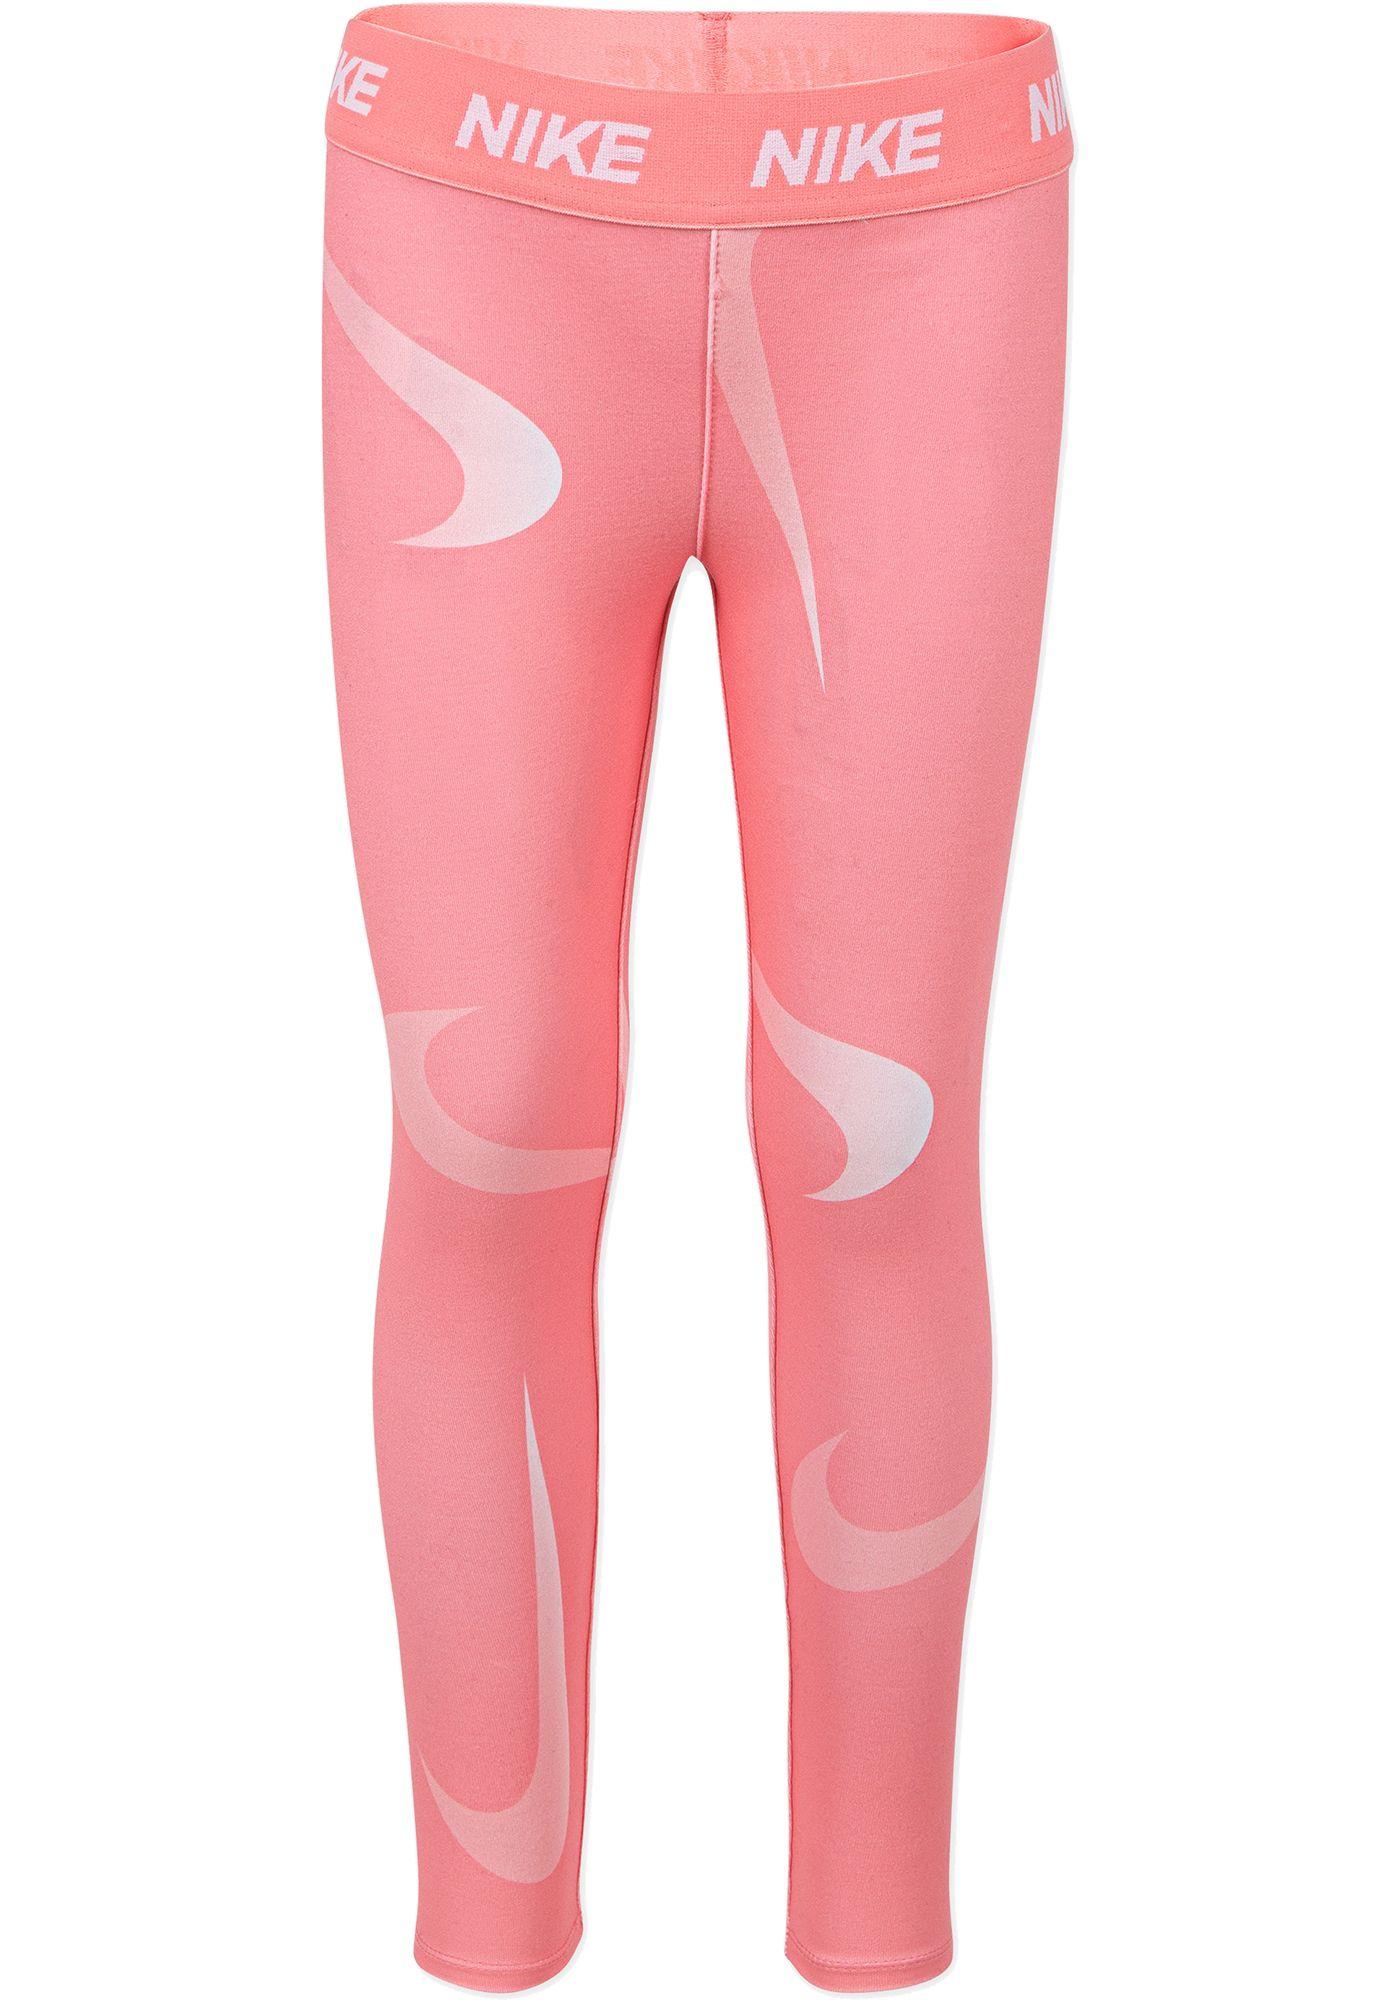 Nike Little Girls' Dri-FIT Leggings